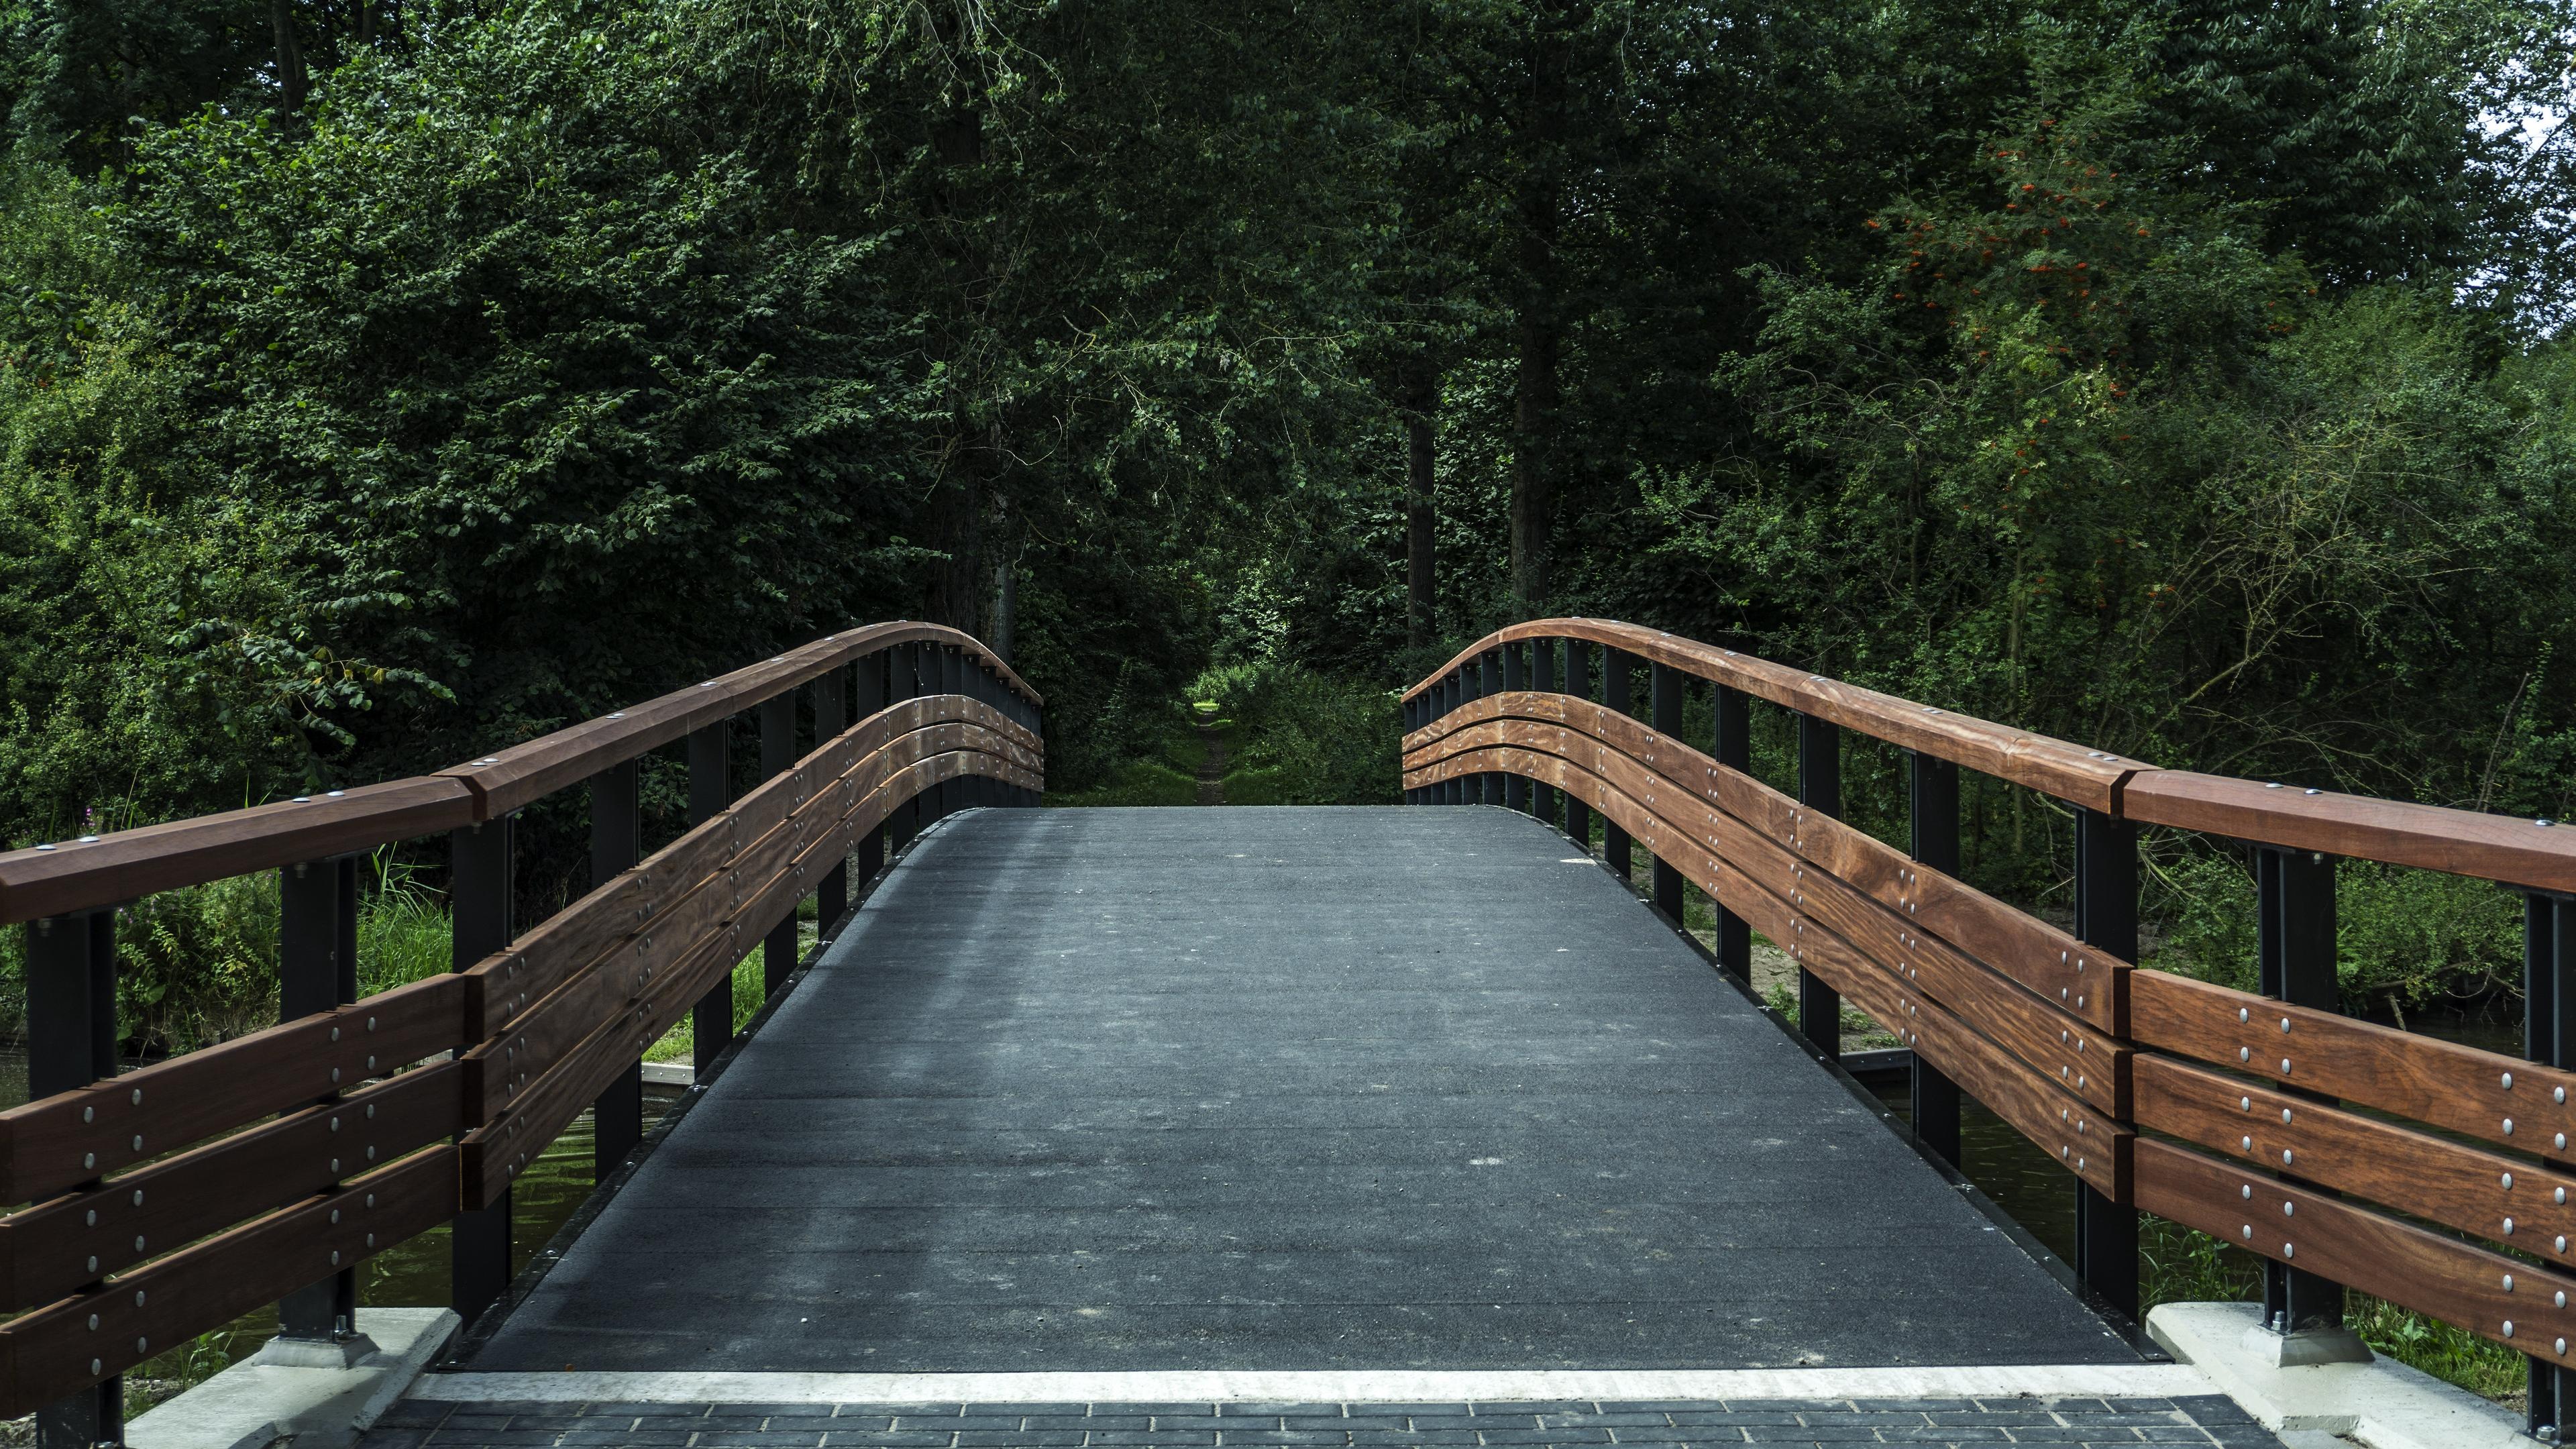 bridge trees forest park 4k 1541116662 - bridge, trees, forest, park 4k - Trees, Forest, bridge